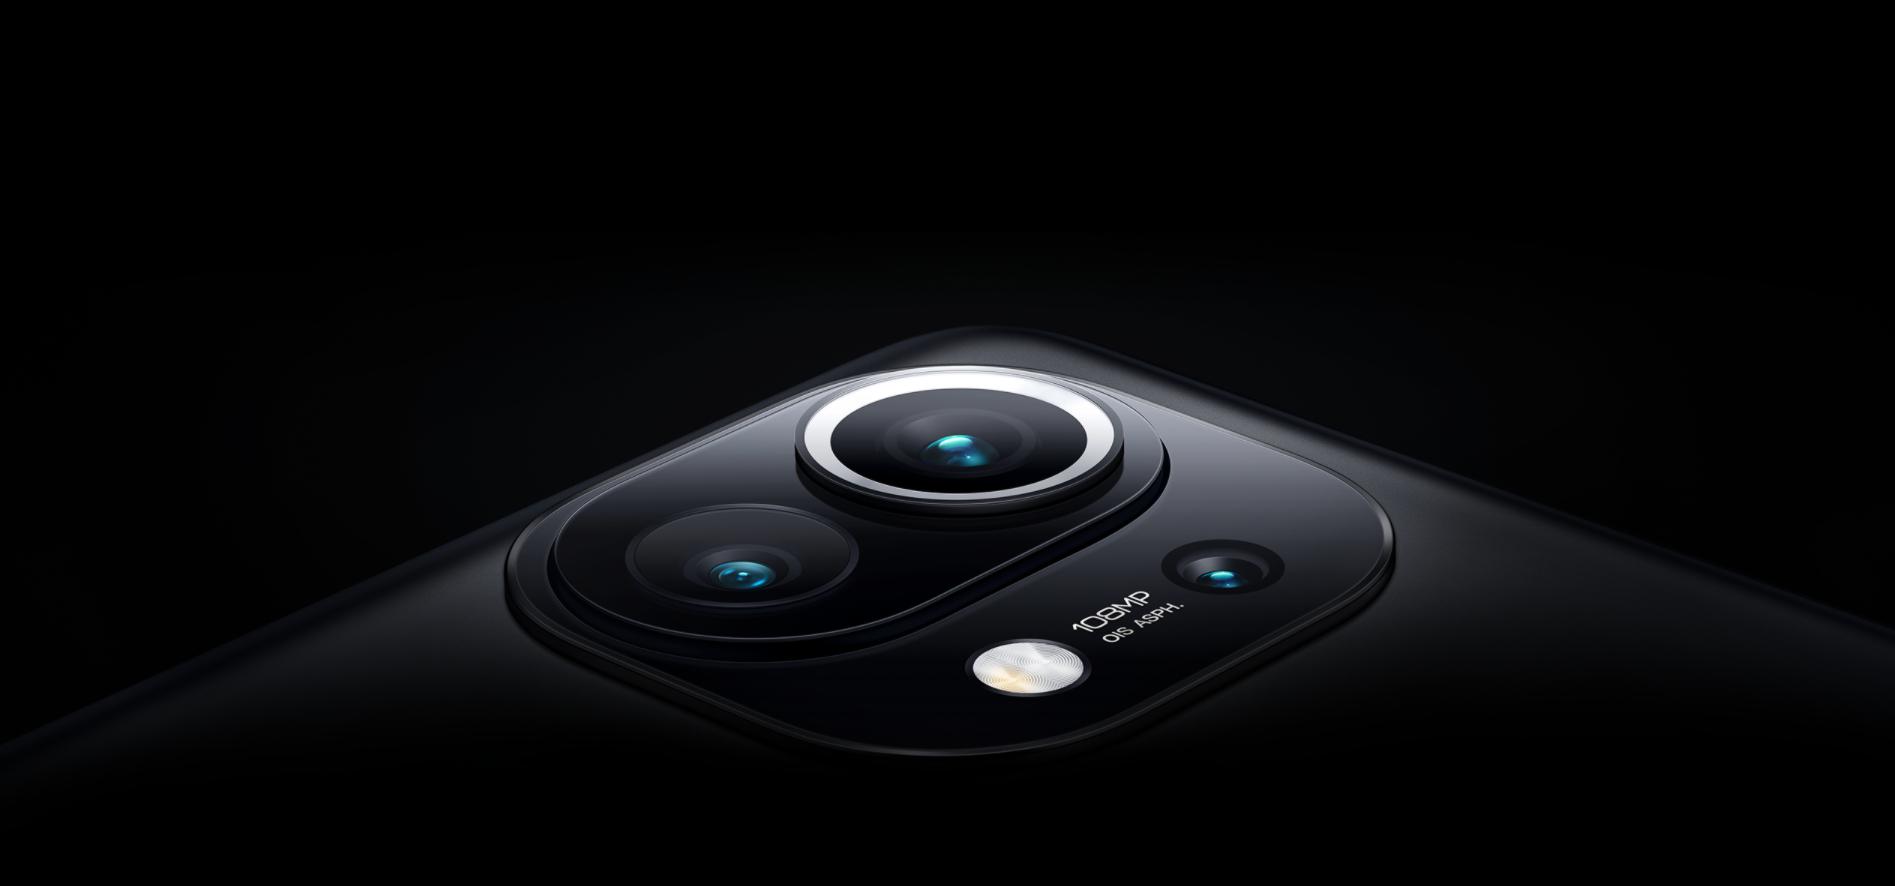 Xiaomi Mi 11 image 5